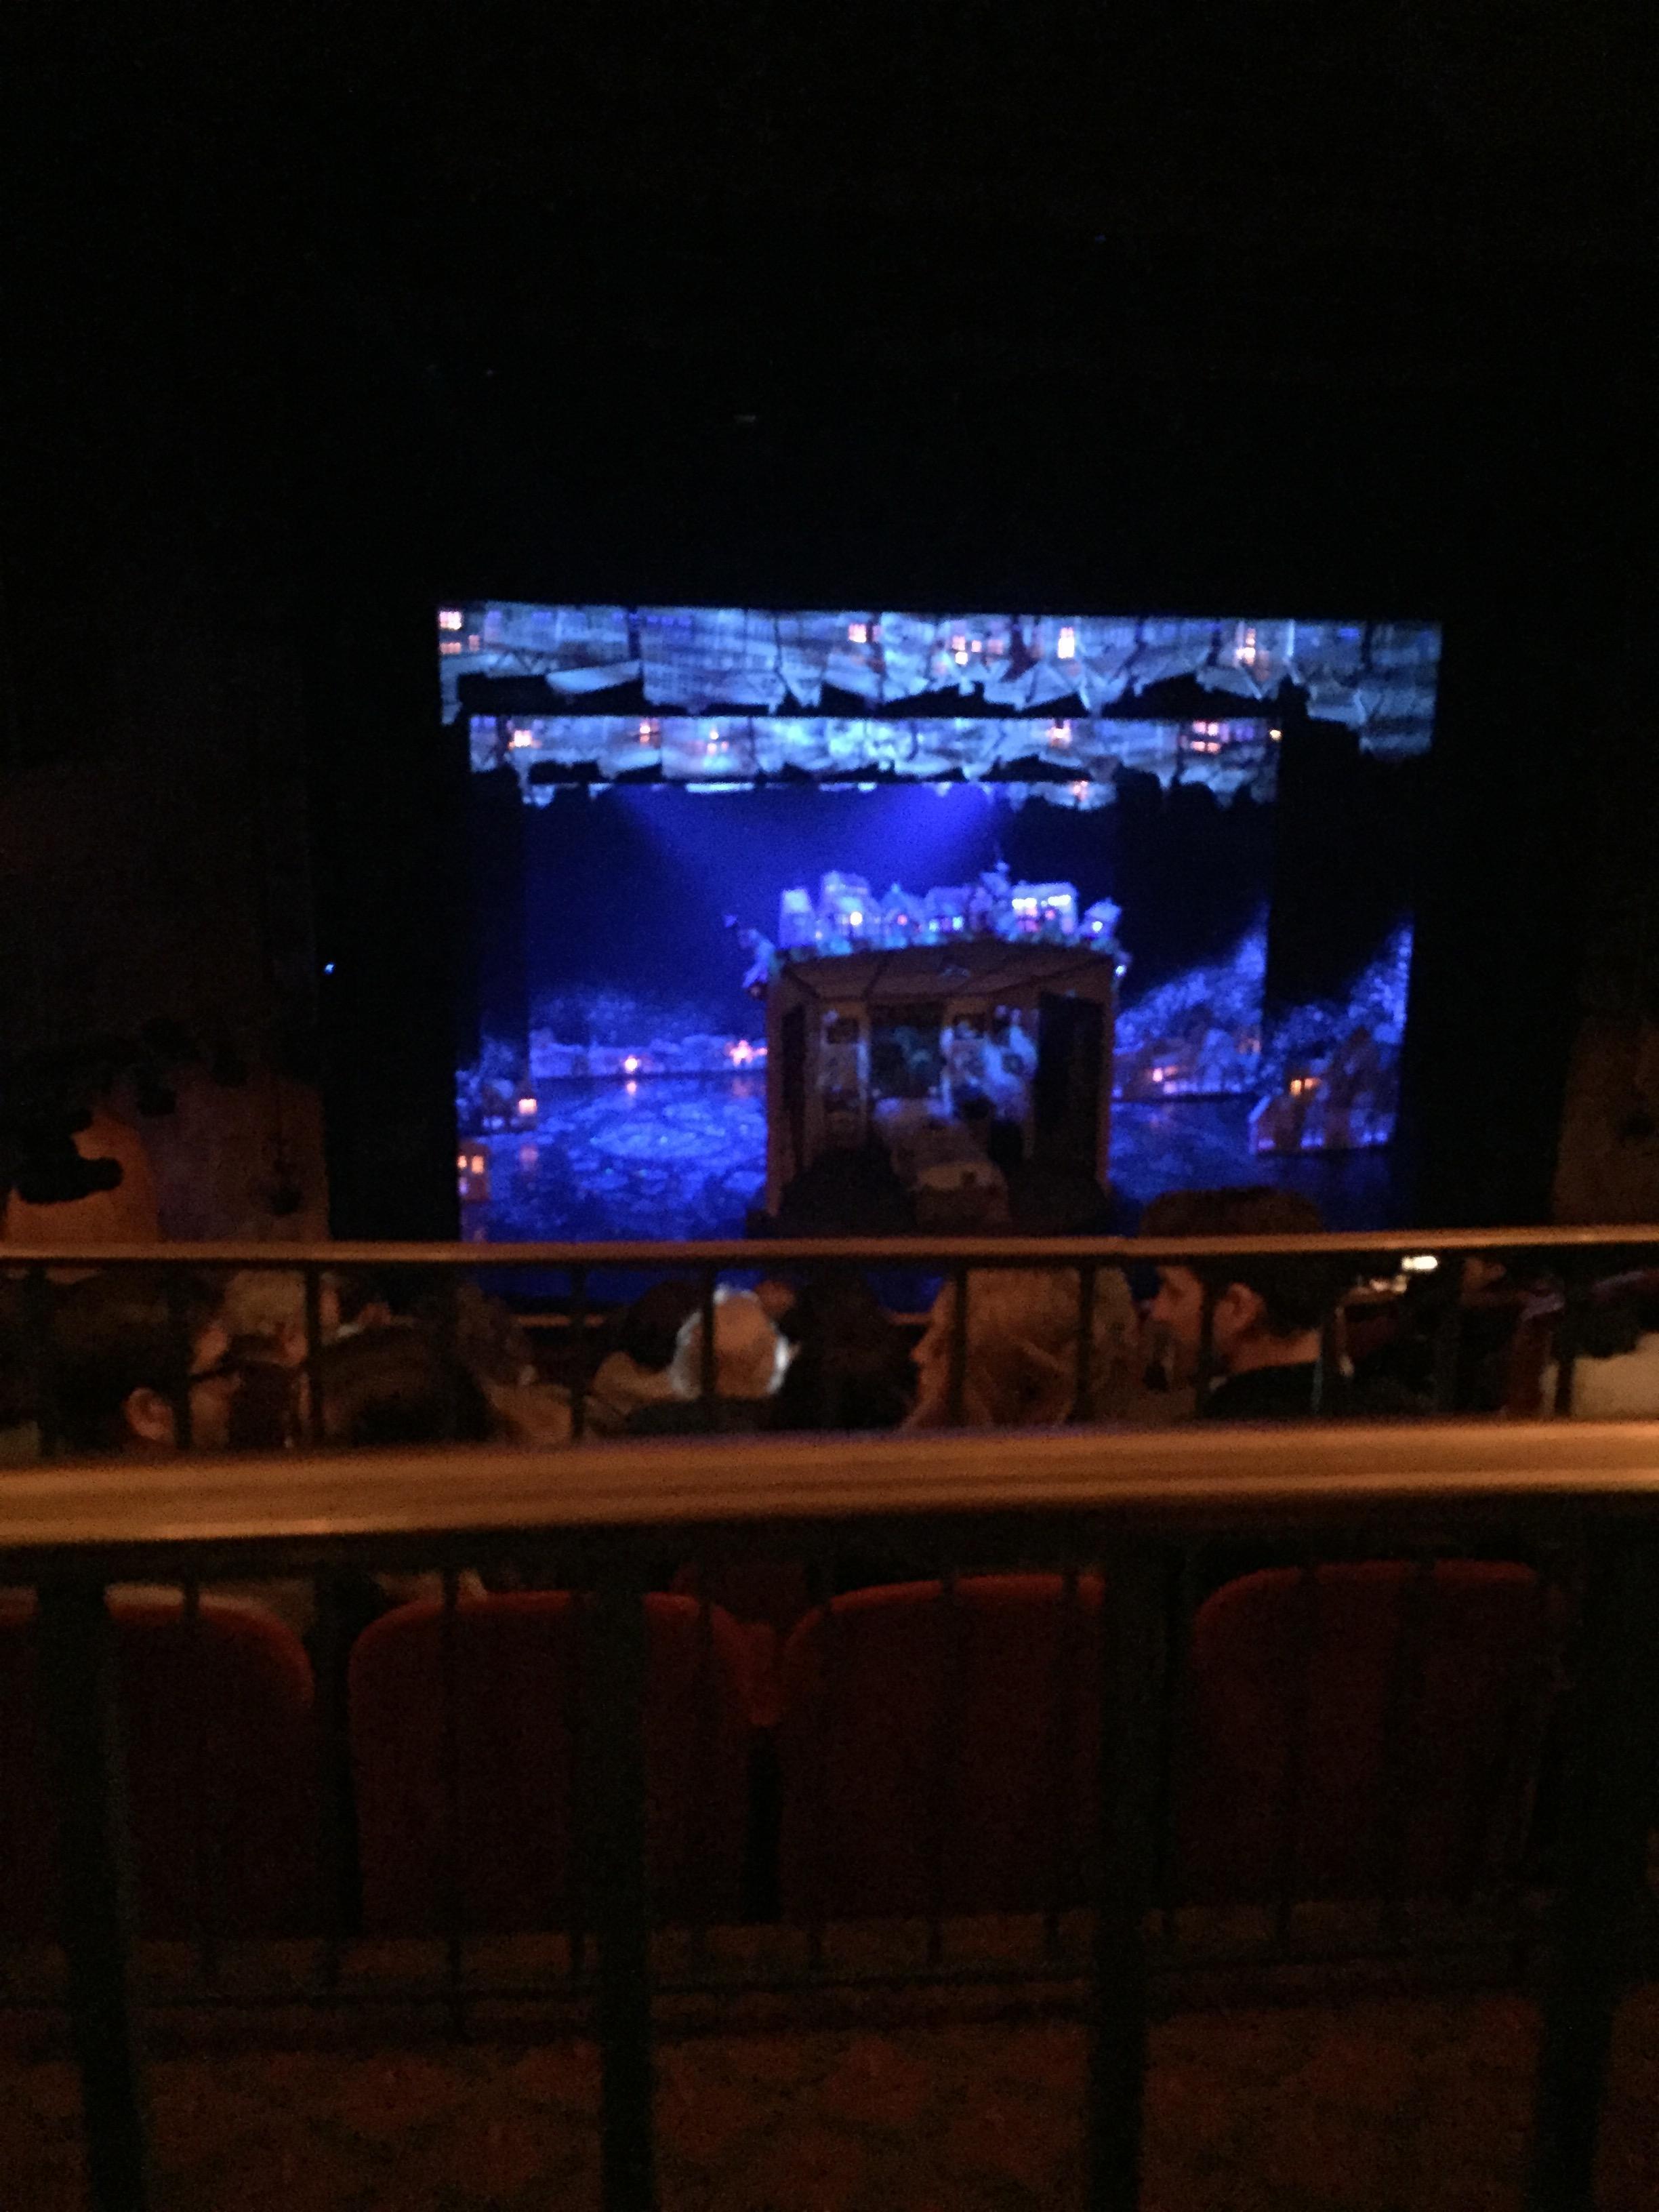 August Wilson Theatre Section Mezzanine L Row H Seat 7